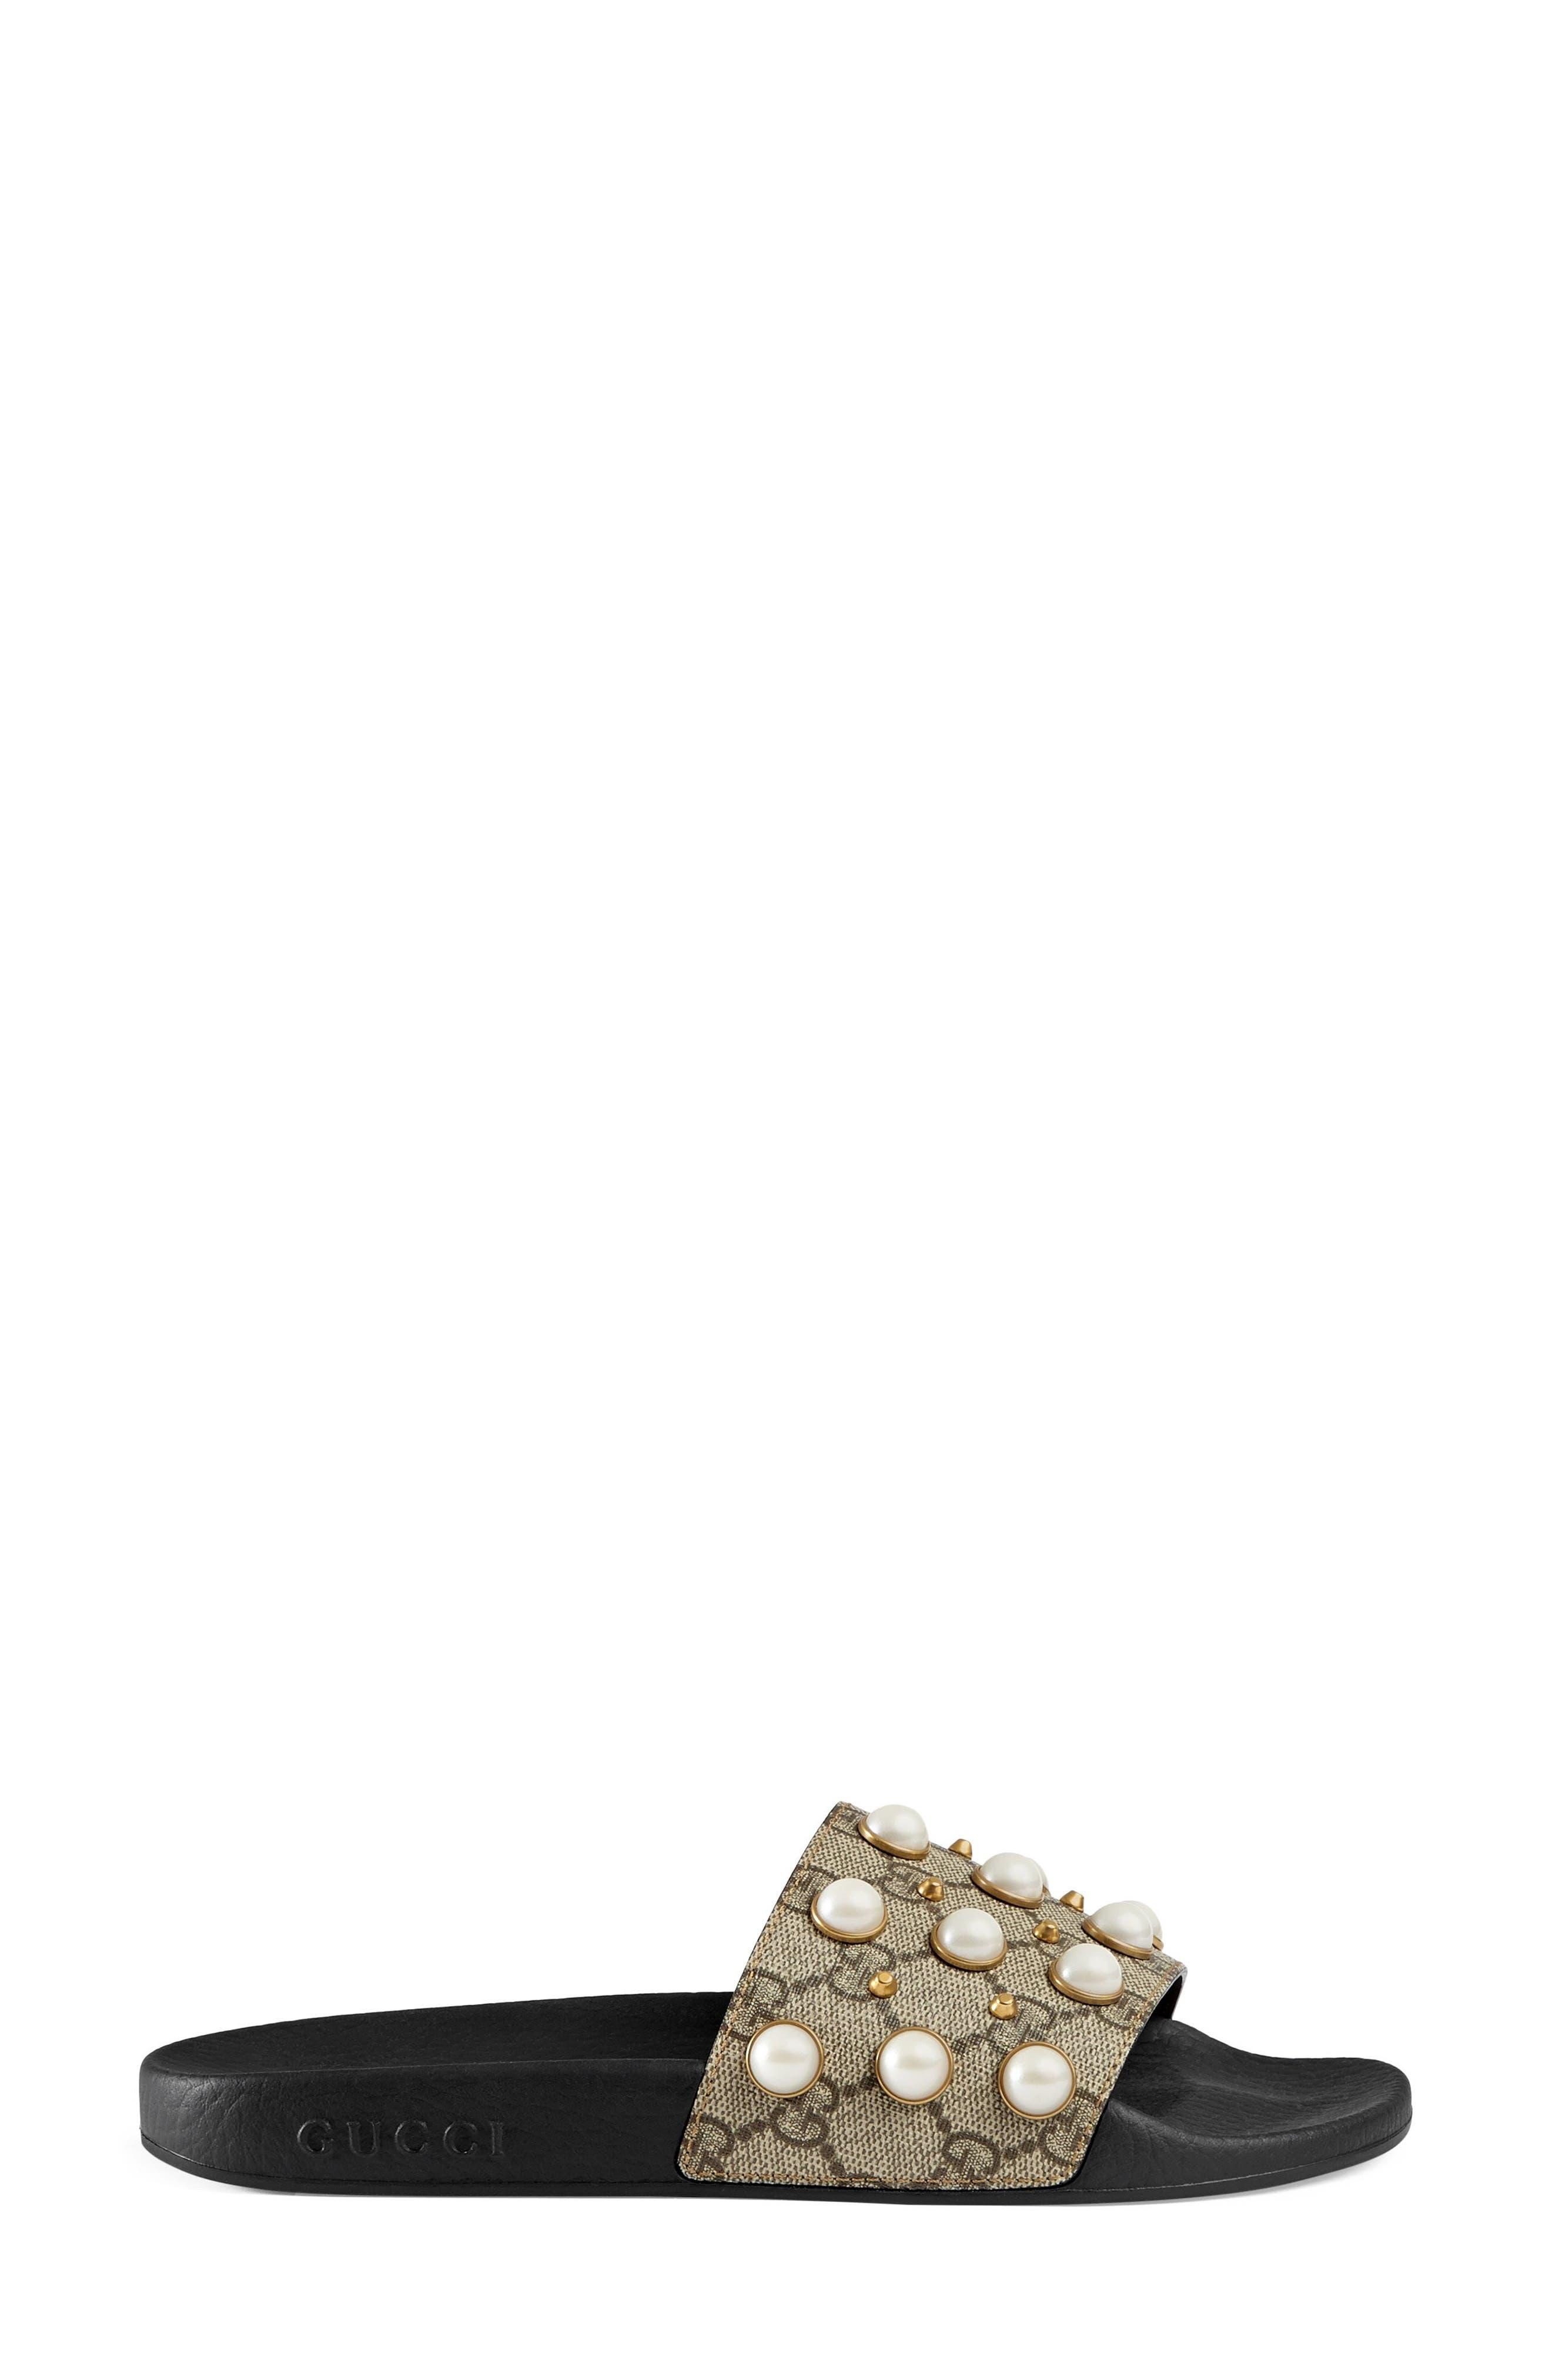 GUCCI, Pursuit Imitation Pearl Embellished Slide Sandal, Main thumbnail 1, color, BEIGE